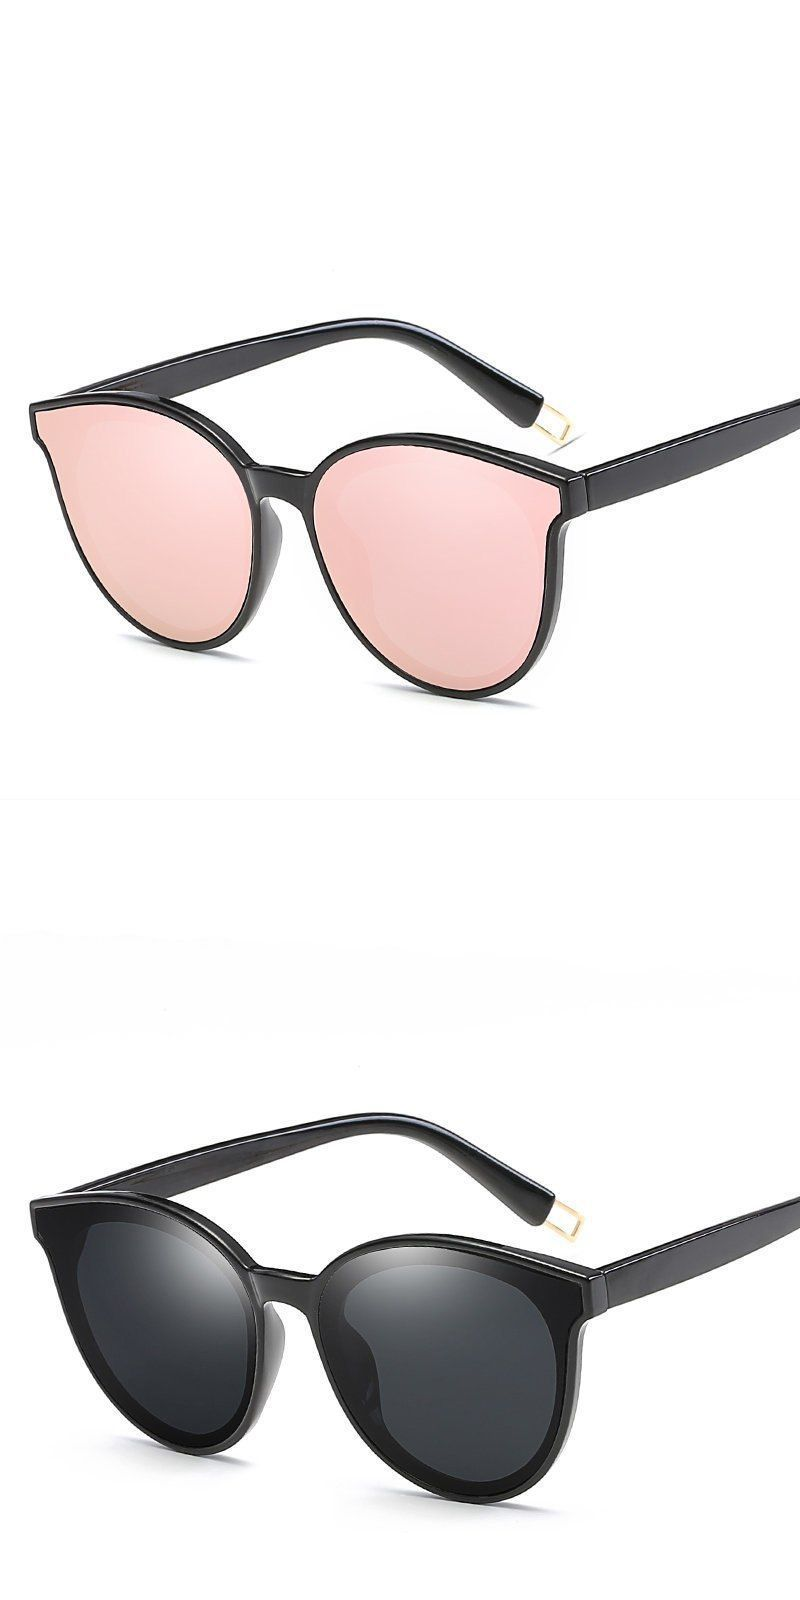 60a778cf1b Fashion women colour luxury flat top cat eye sunglasses elegant oculos de  sol men twin beam oversize sun glasses uv400  sunglasses  eyewear  58mm  cat   eye ...